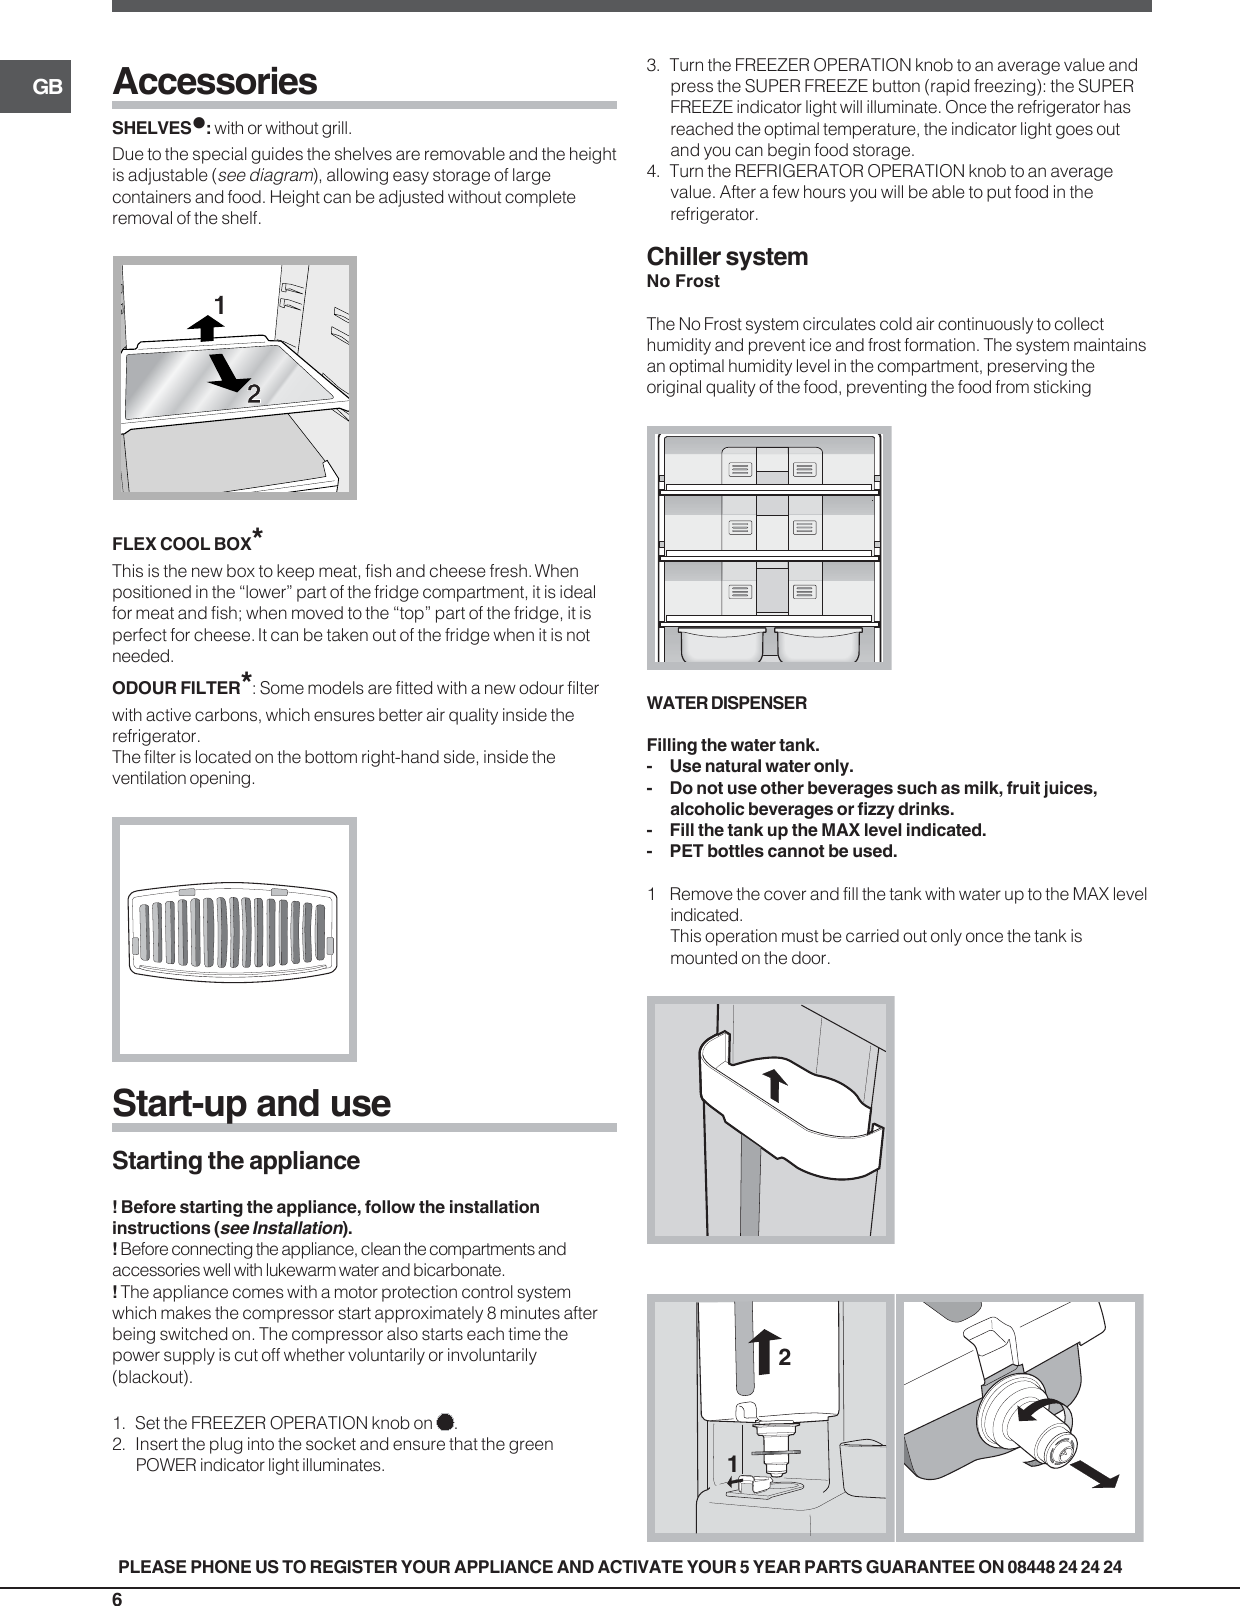 Indesit refrigerator ban 40 users manual 19508693000gb tr page 6 of 12 indesit indesit refrigerator ban 40 users cheapraybanclubmaster Images